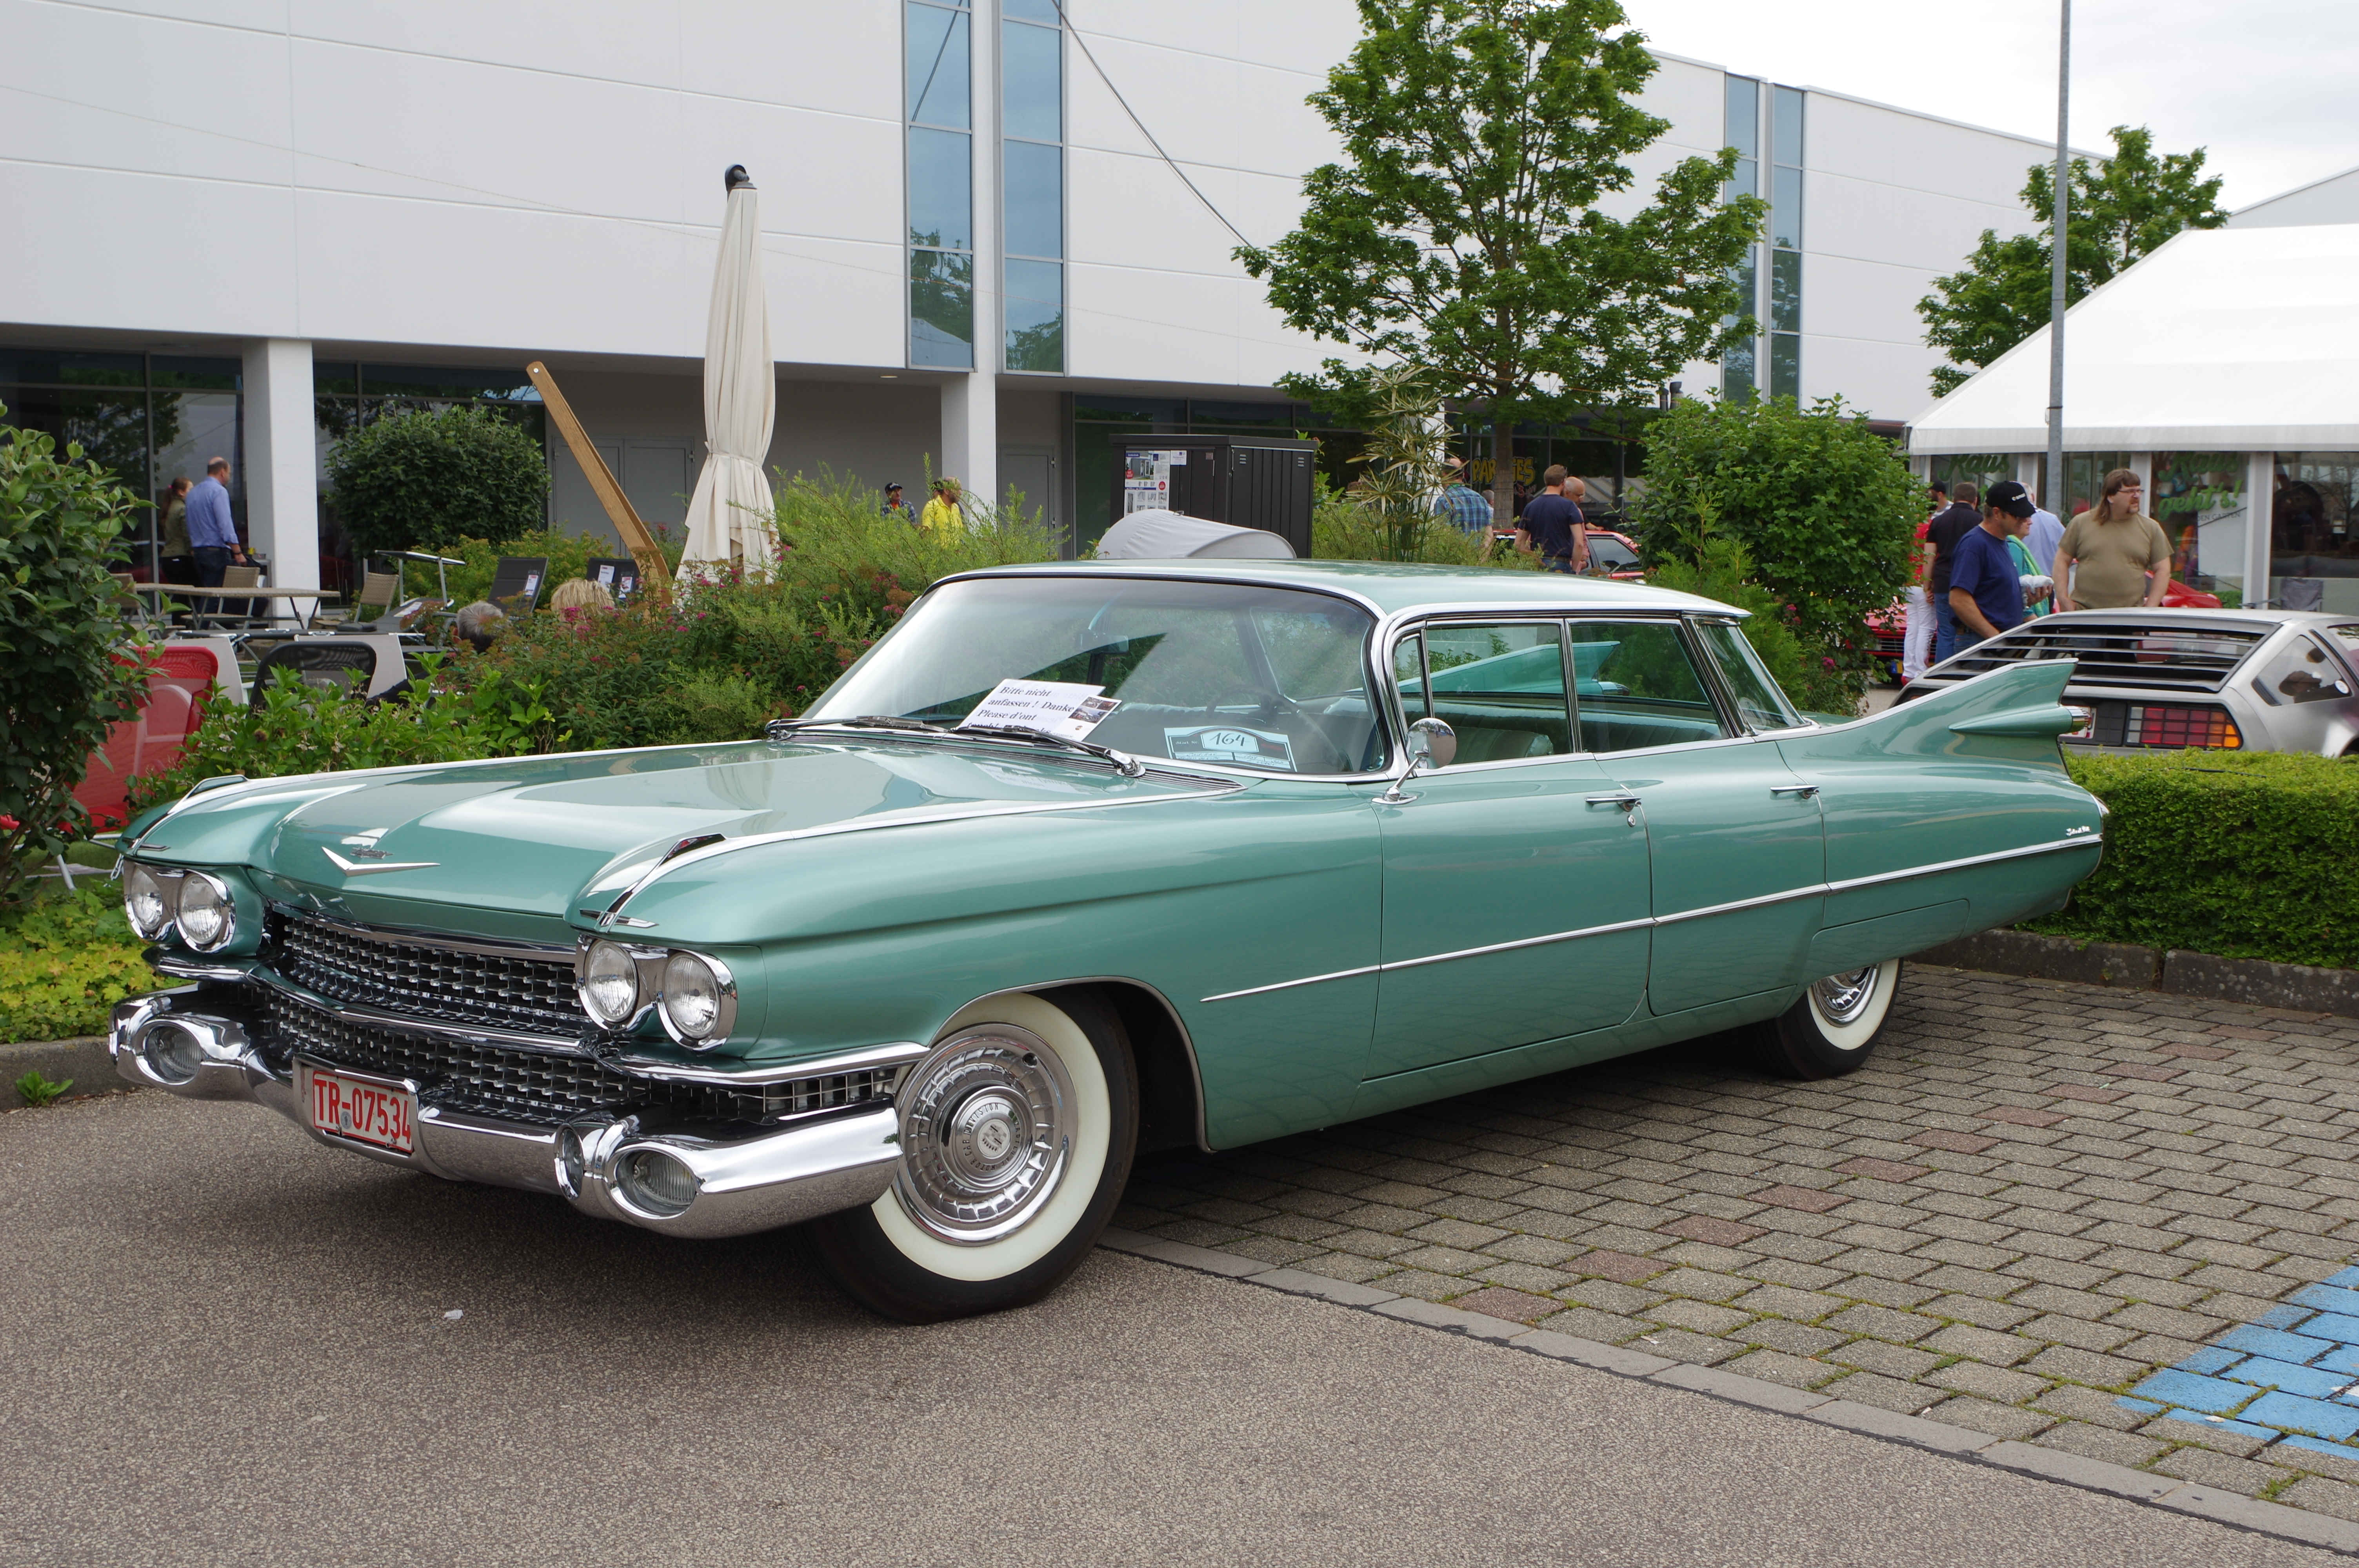 Cadillac_Sedan_de_Ville_BW_2017-07-16_13